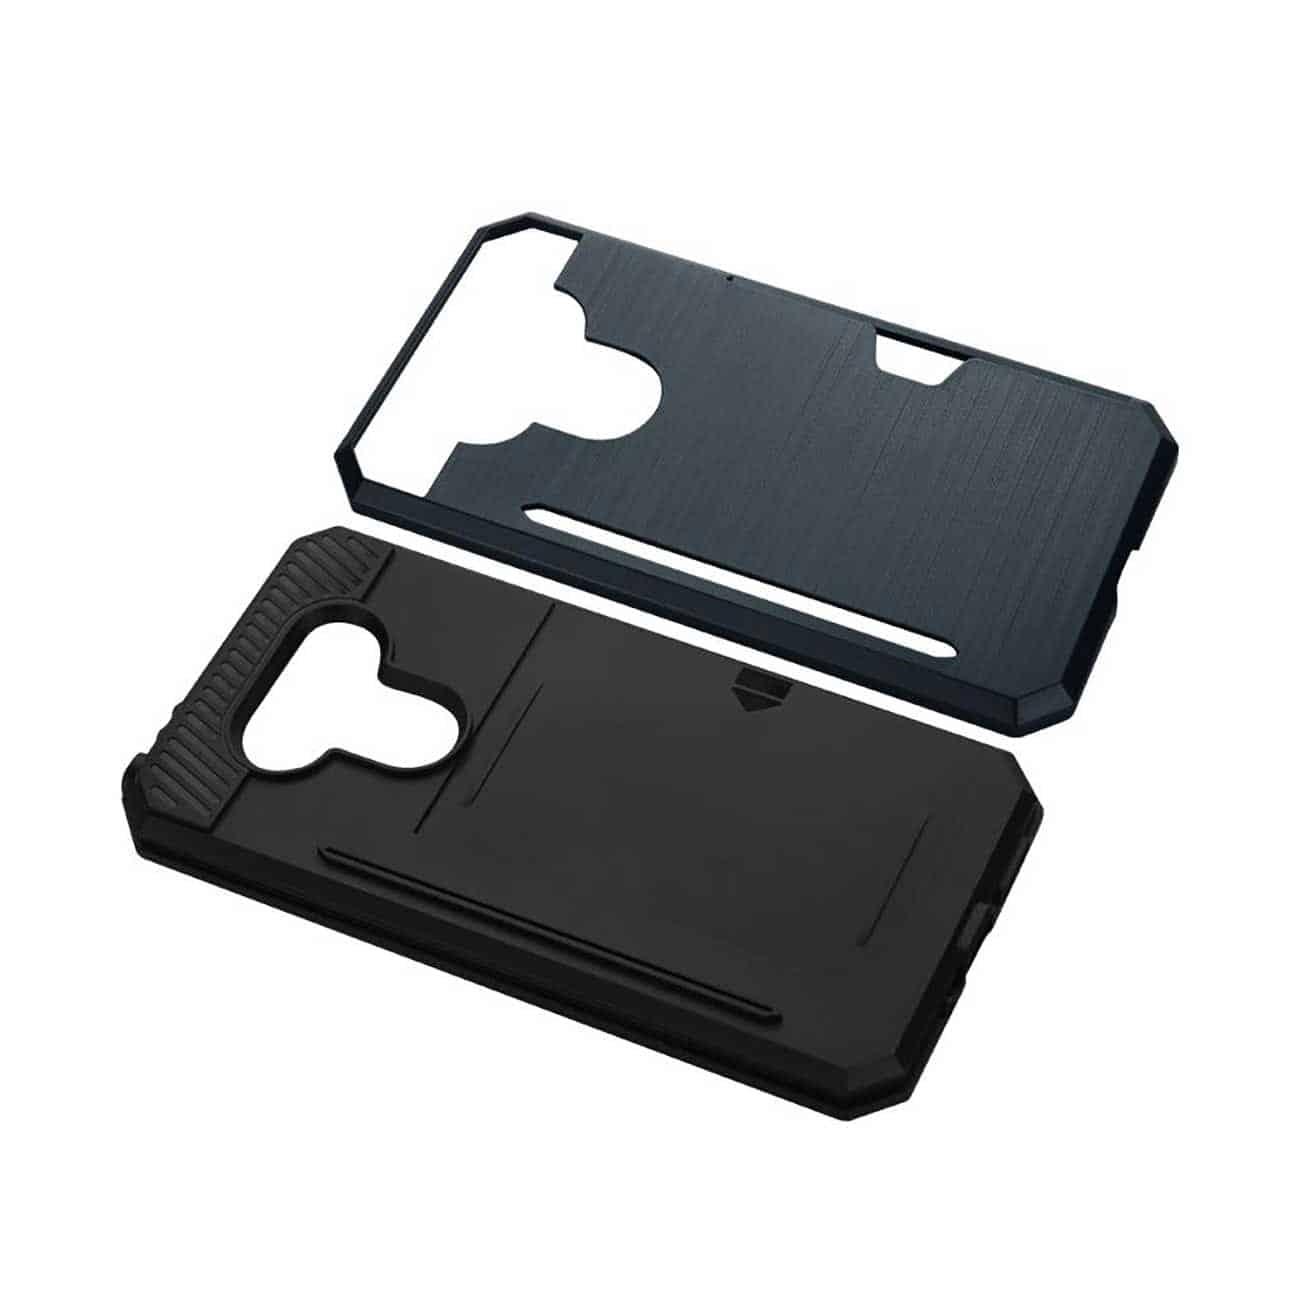 LG G5 SLIM ARMOR HYBRID CASE WITH CARD HOLDER IN NAVY